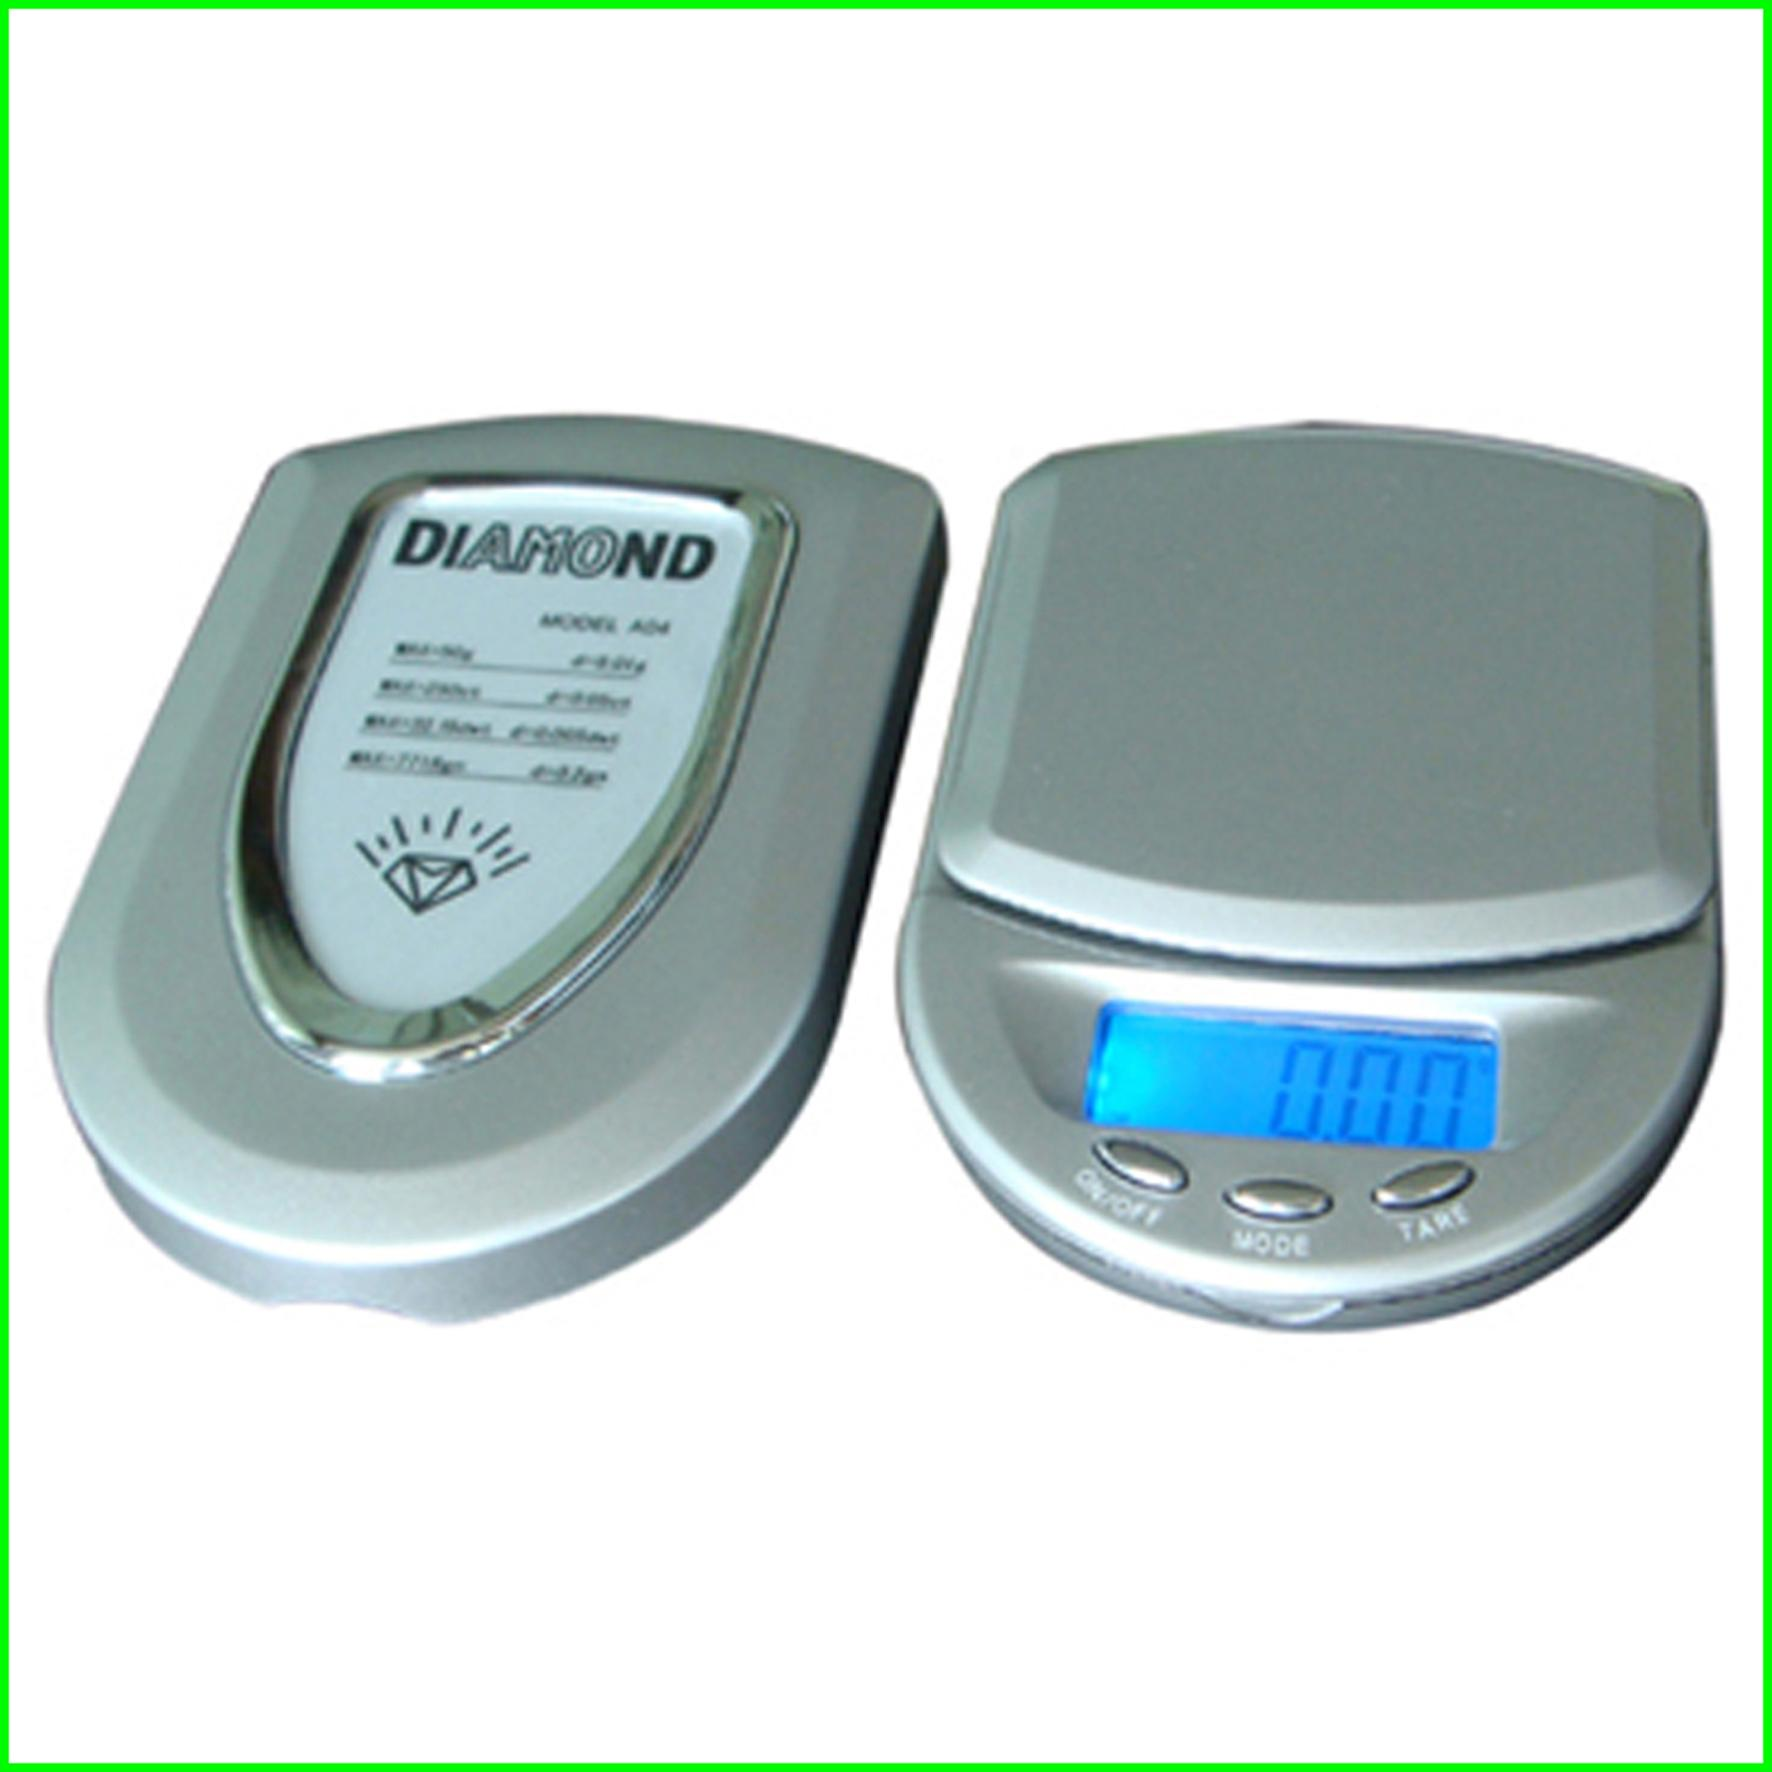 Diamond Scale PS-A04 1